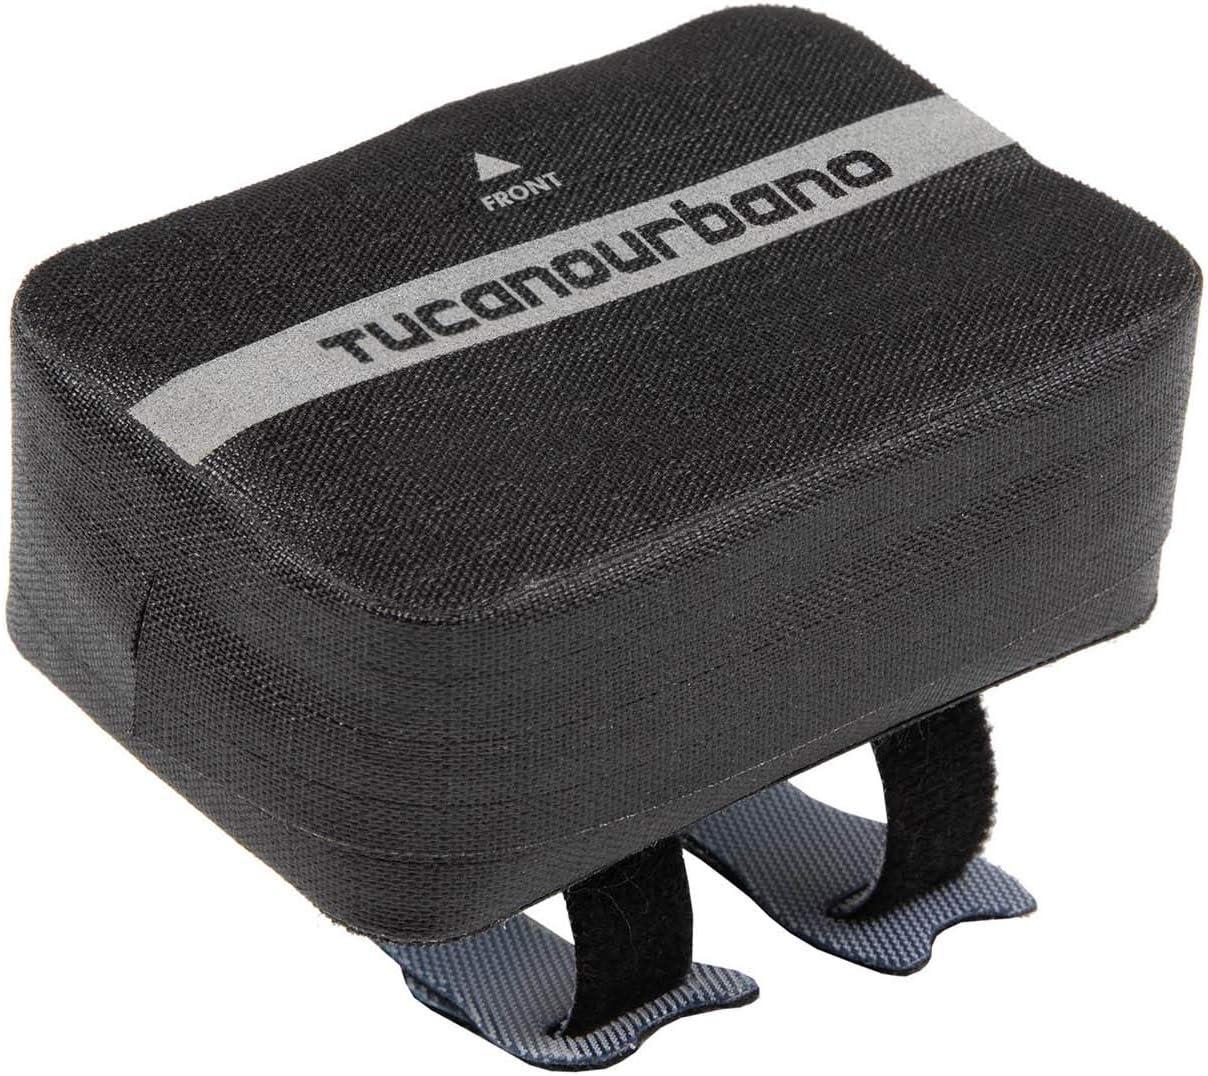 Tucano Urbano Unisexs Handbag Black, us:one size